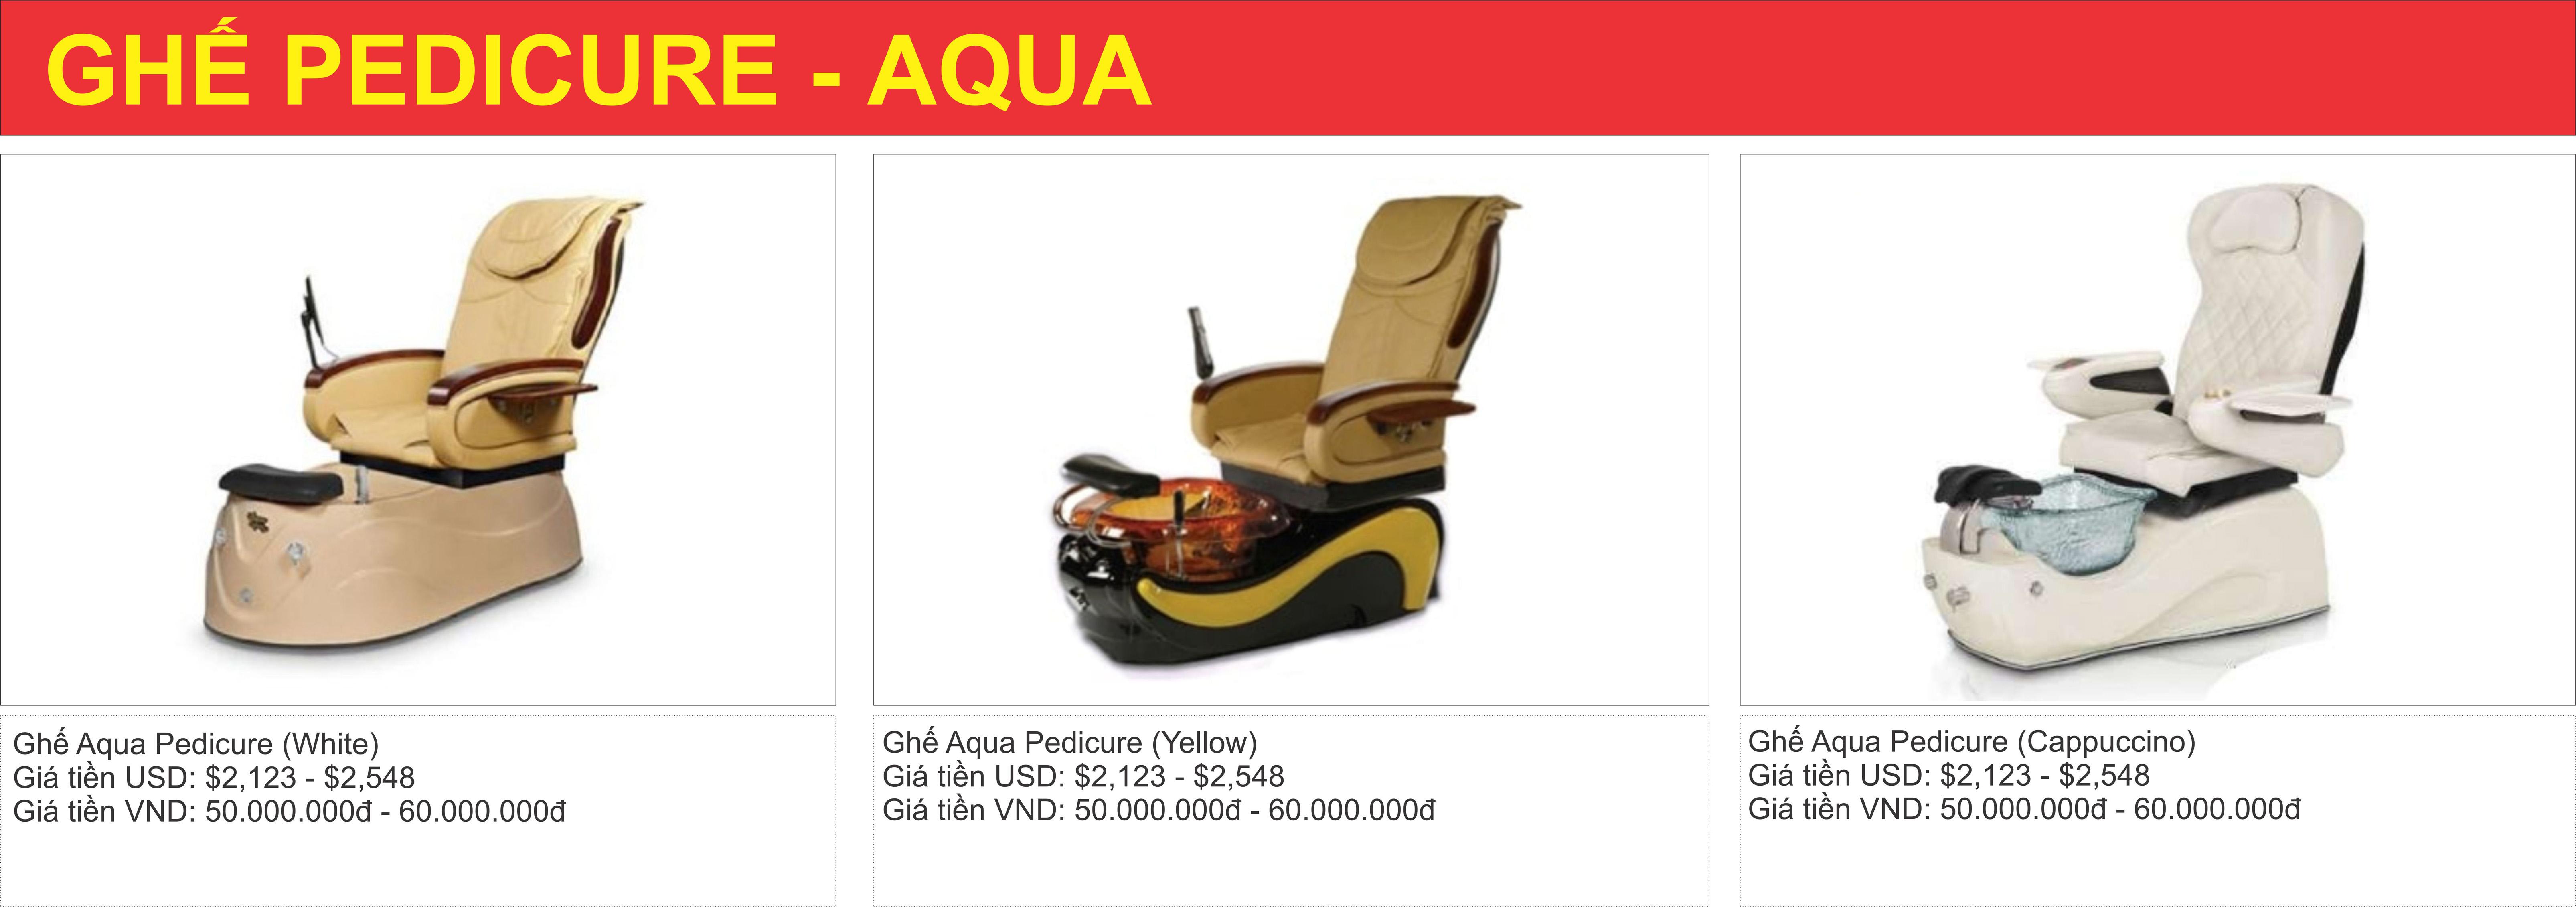 ghe-nail-pedicure-aqua